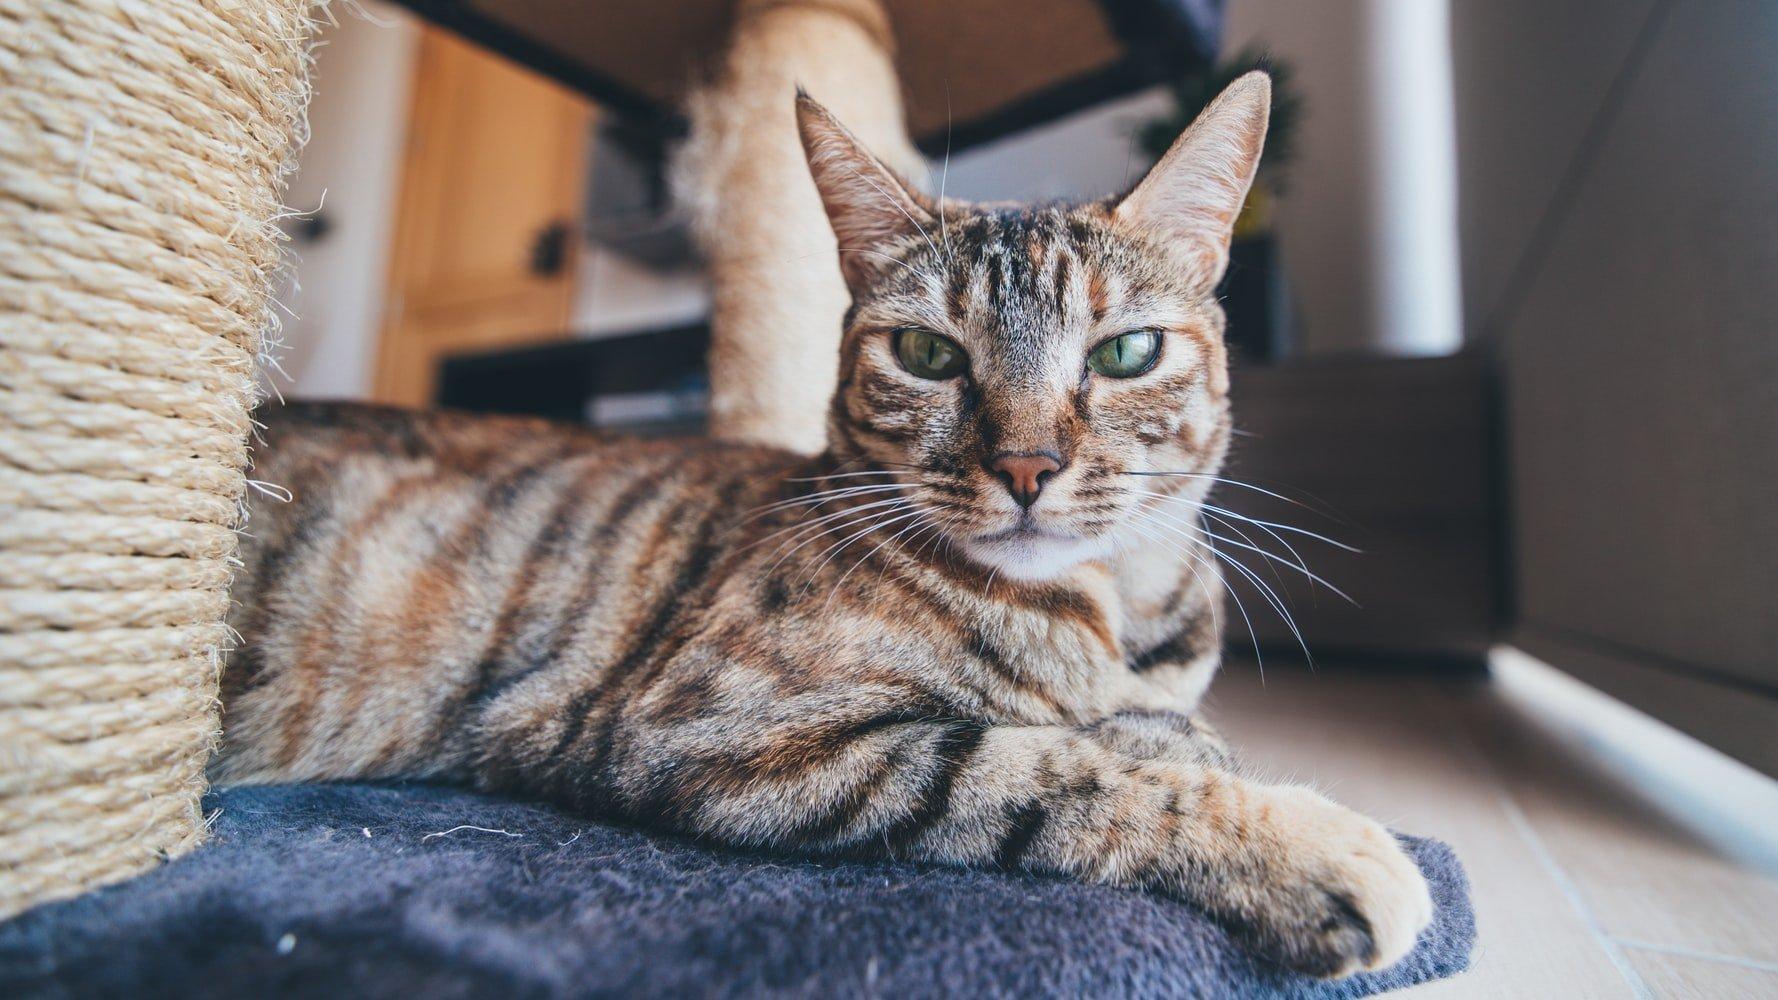 cat dandruff or flea eggs